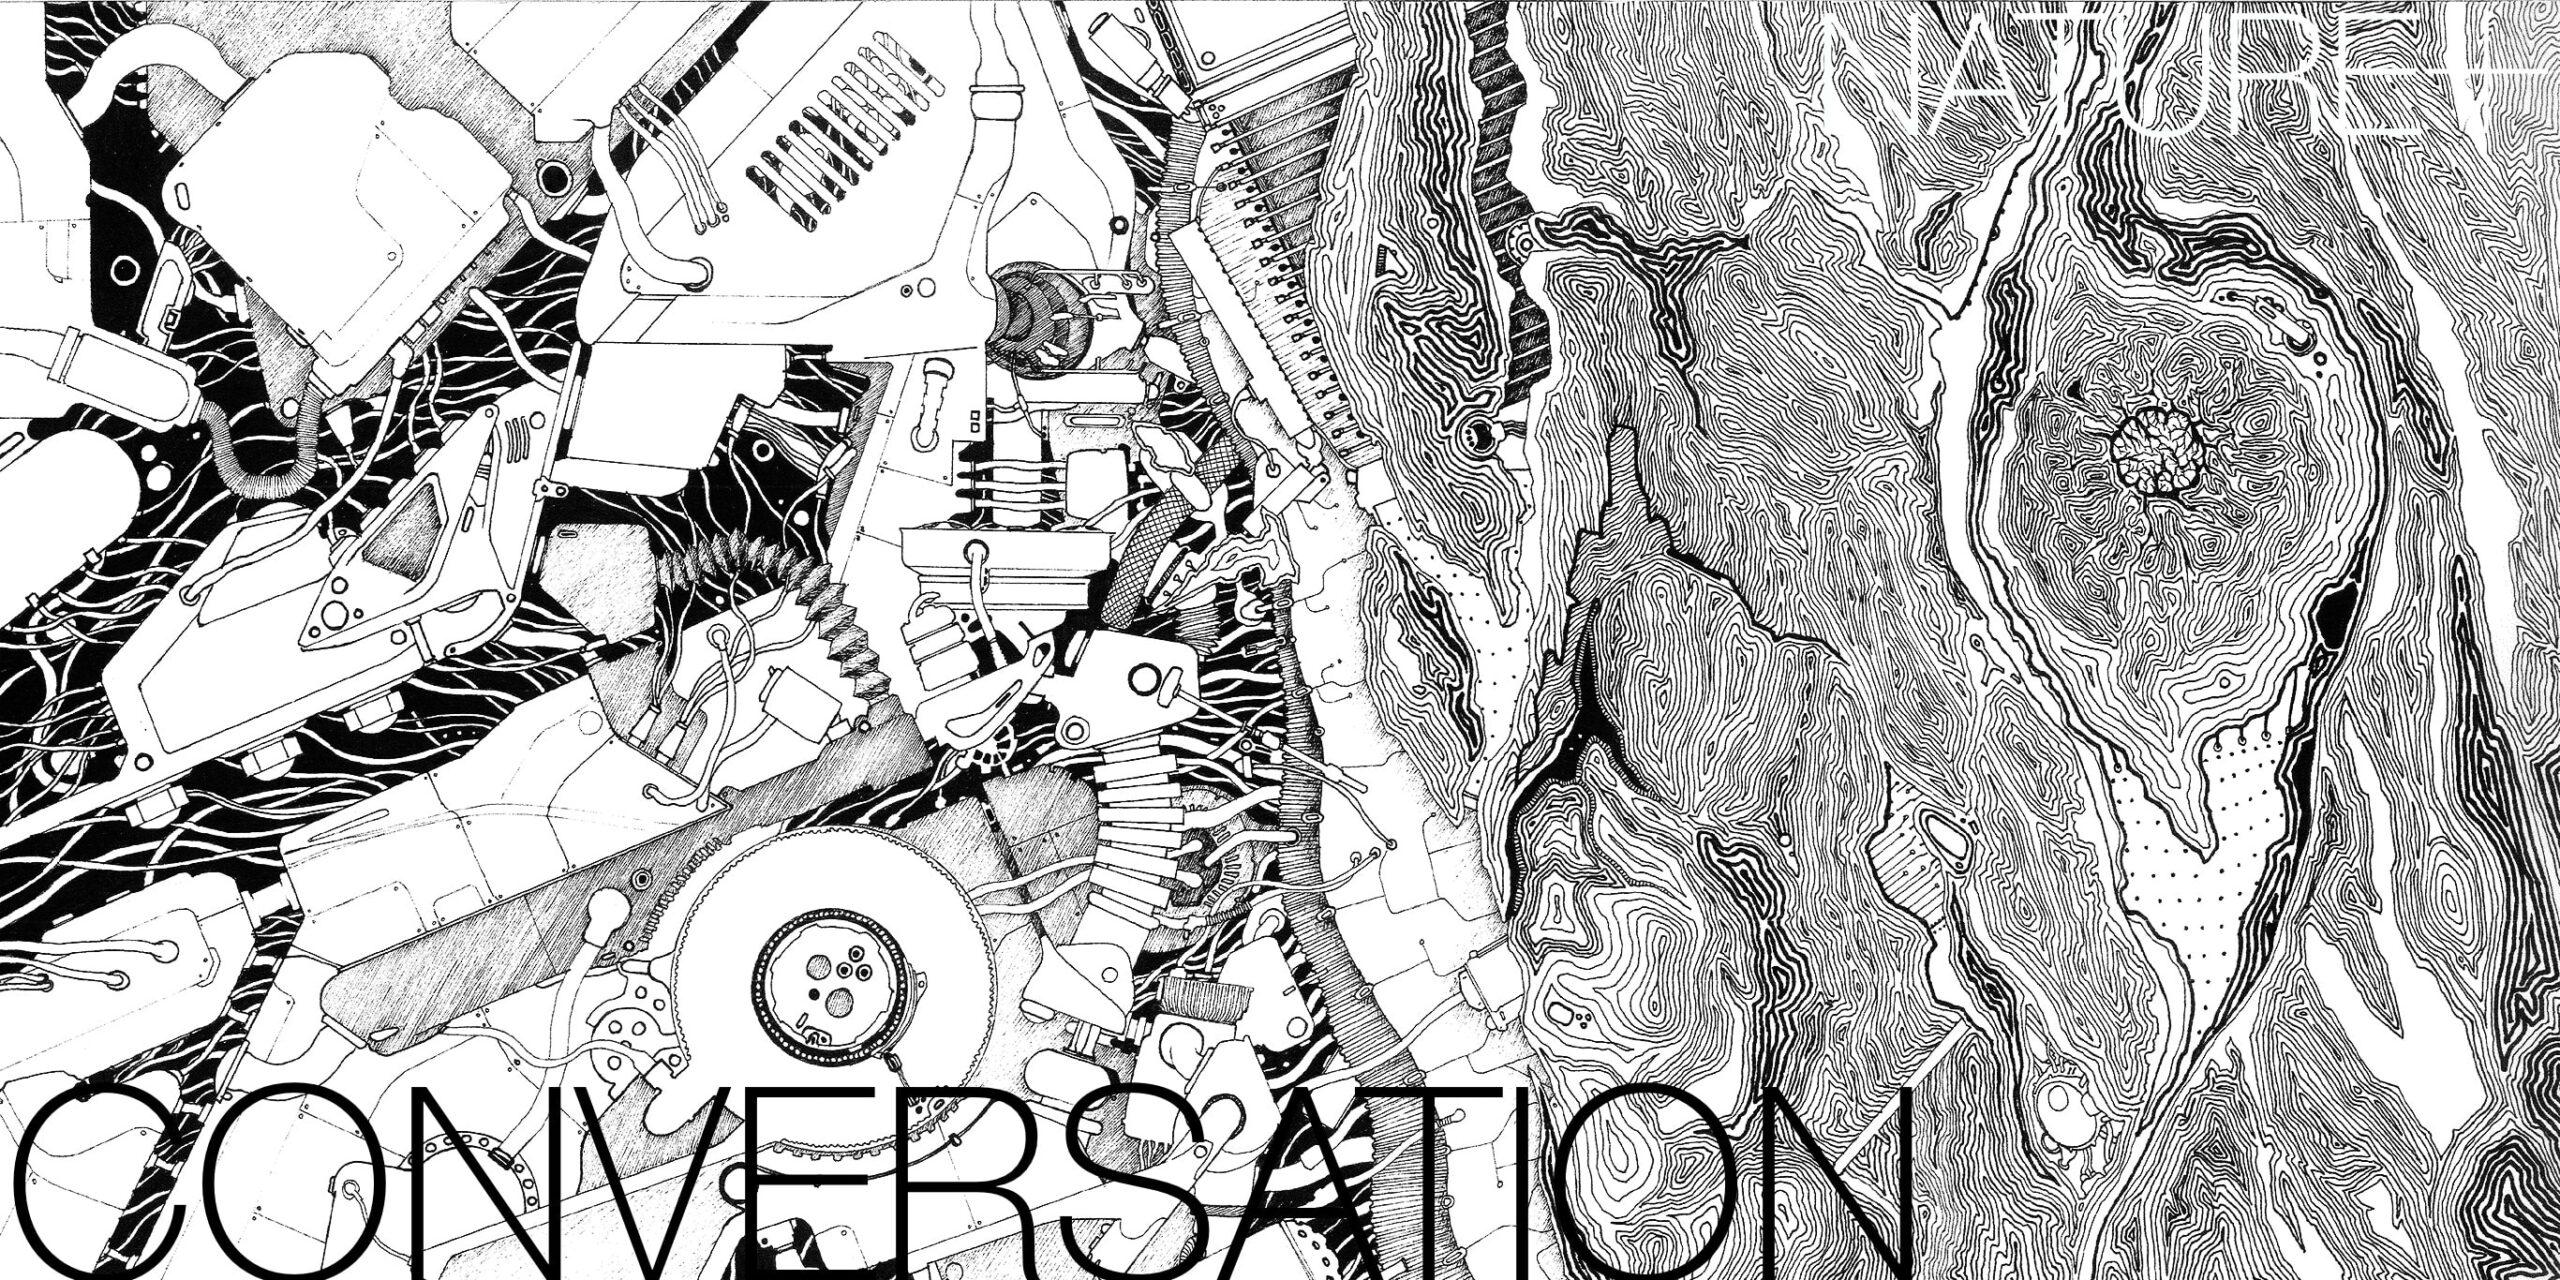 Talks by Umair Zia- founder of Nature Gadgets and NatureTutor.com